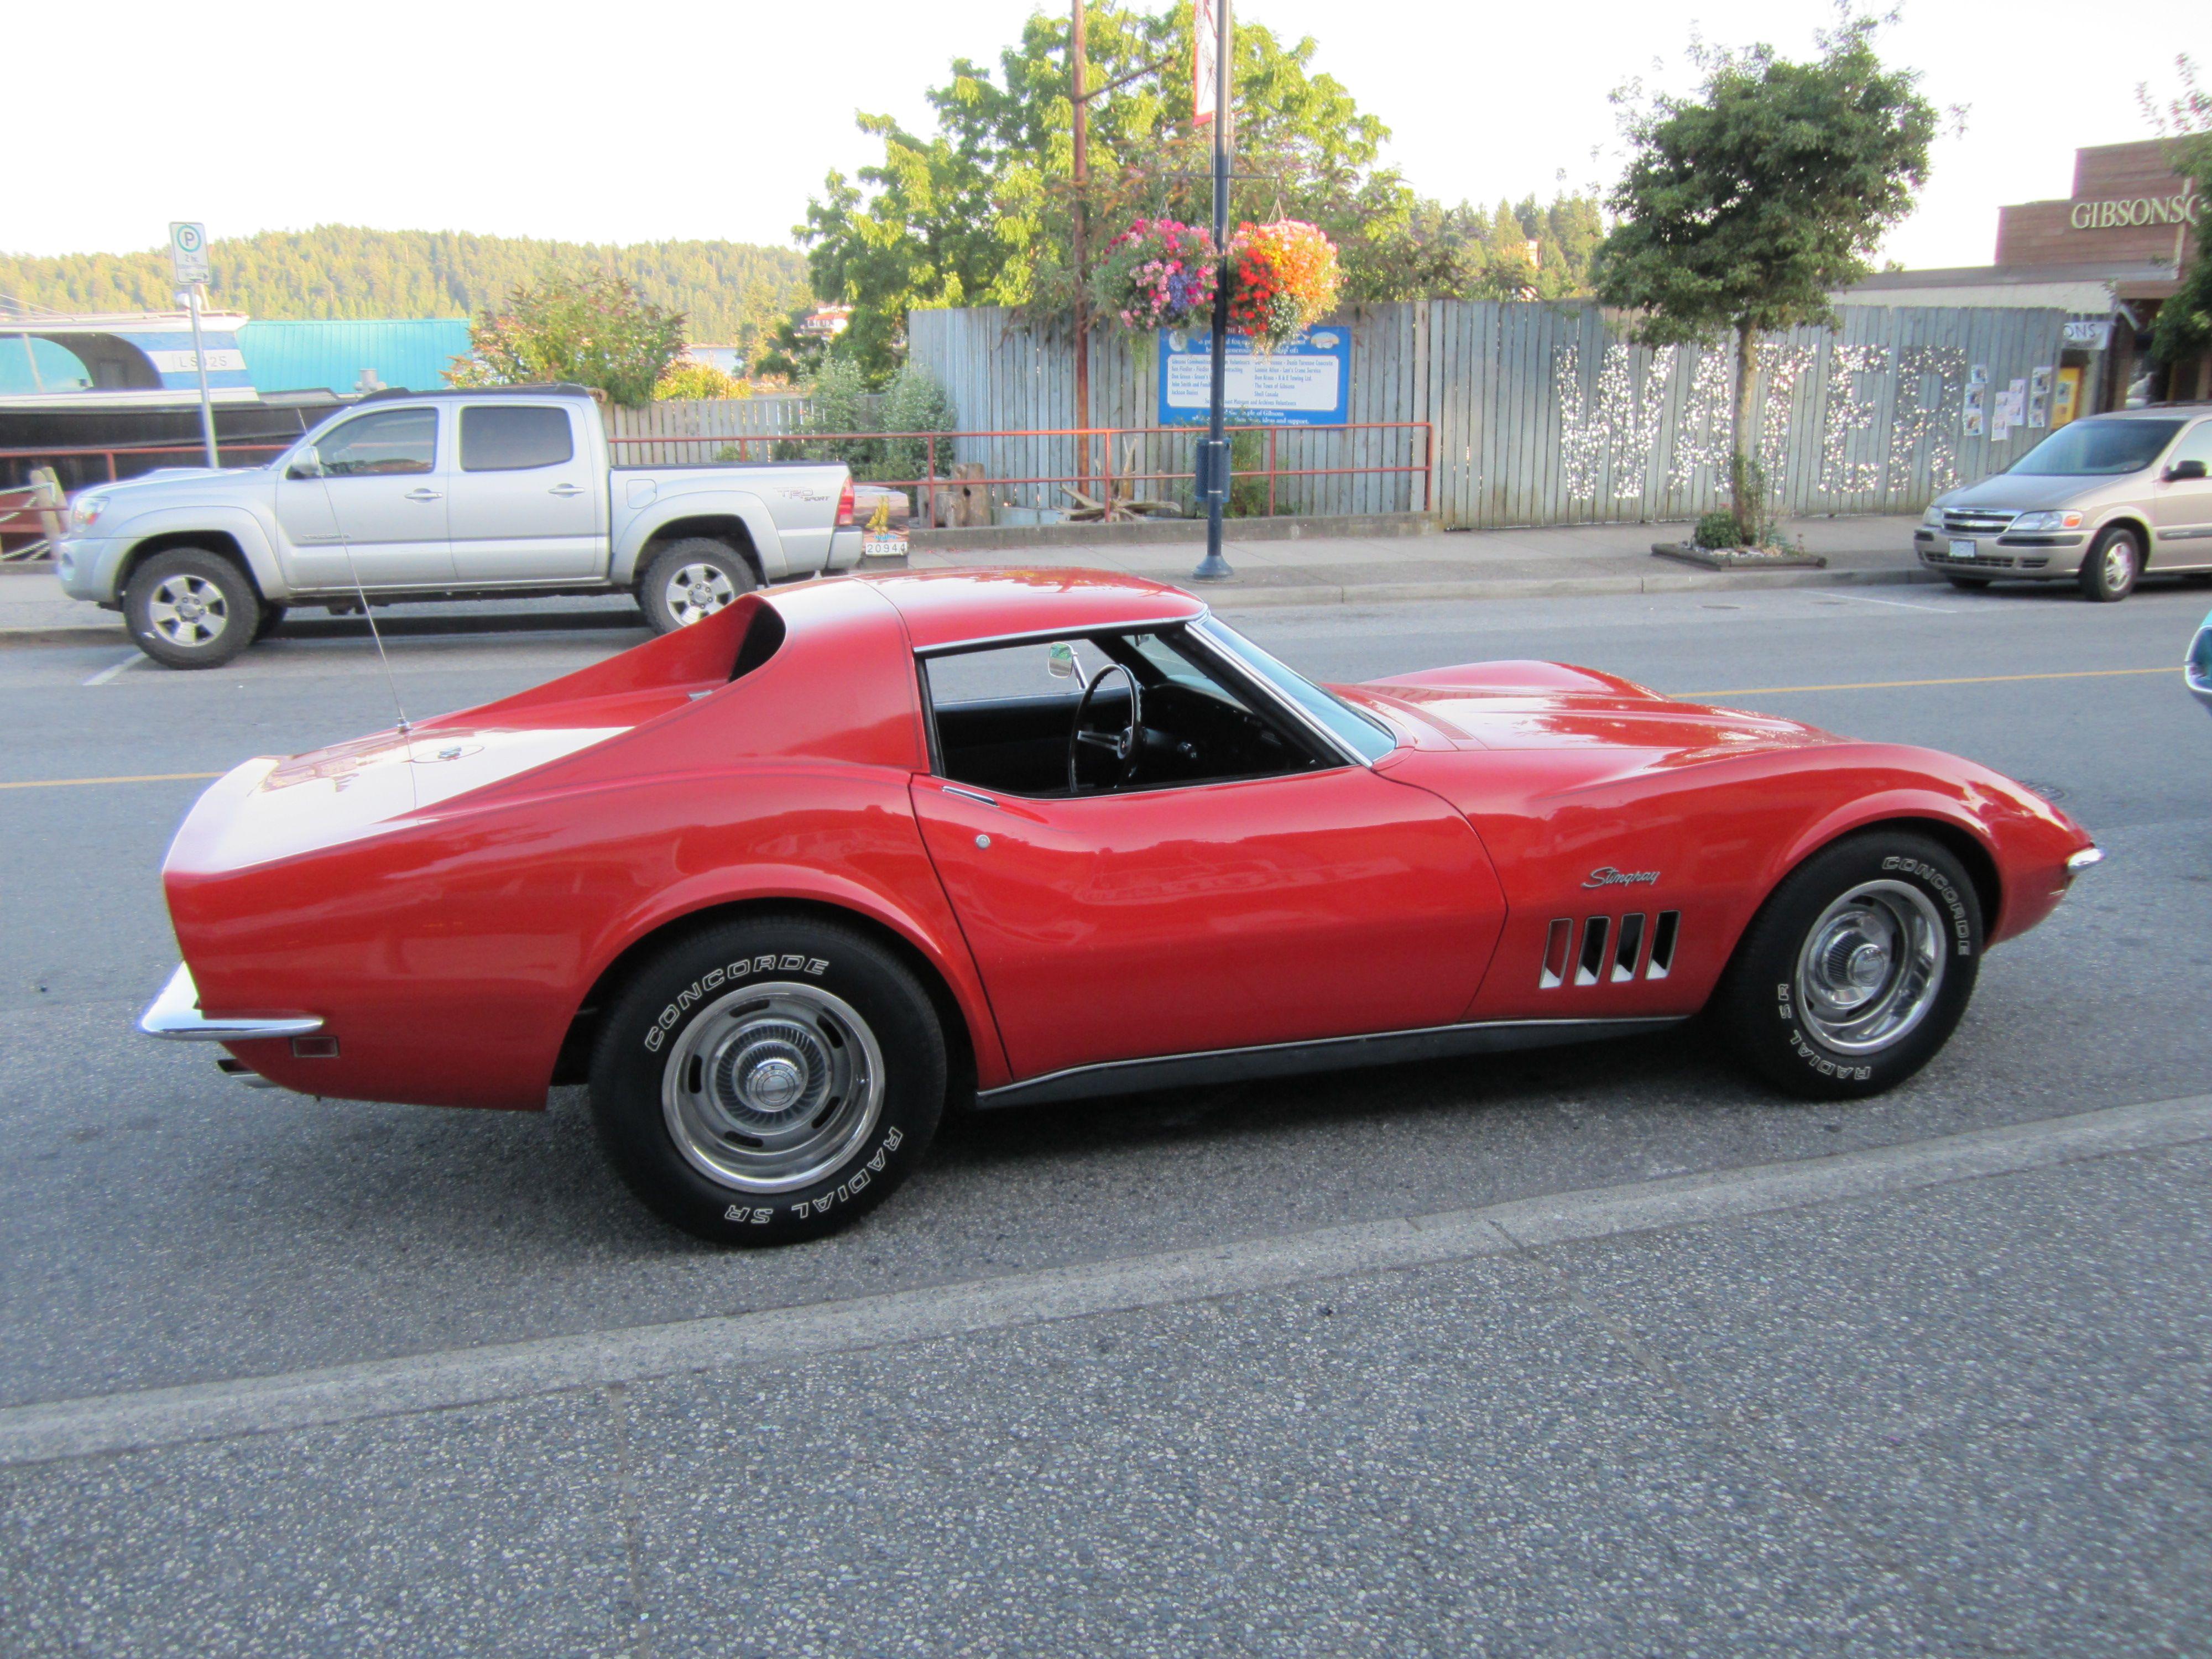 60s corvette   I\'ll stand-by Corvettes   Pinterest   Corvette and Cars